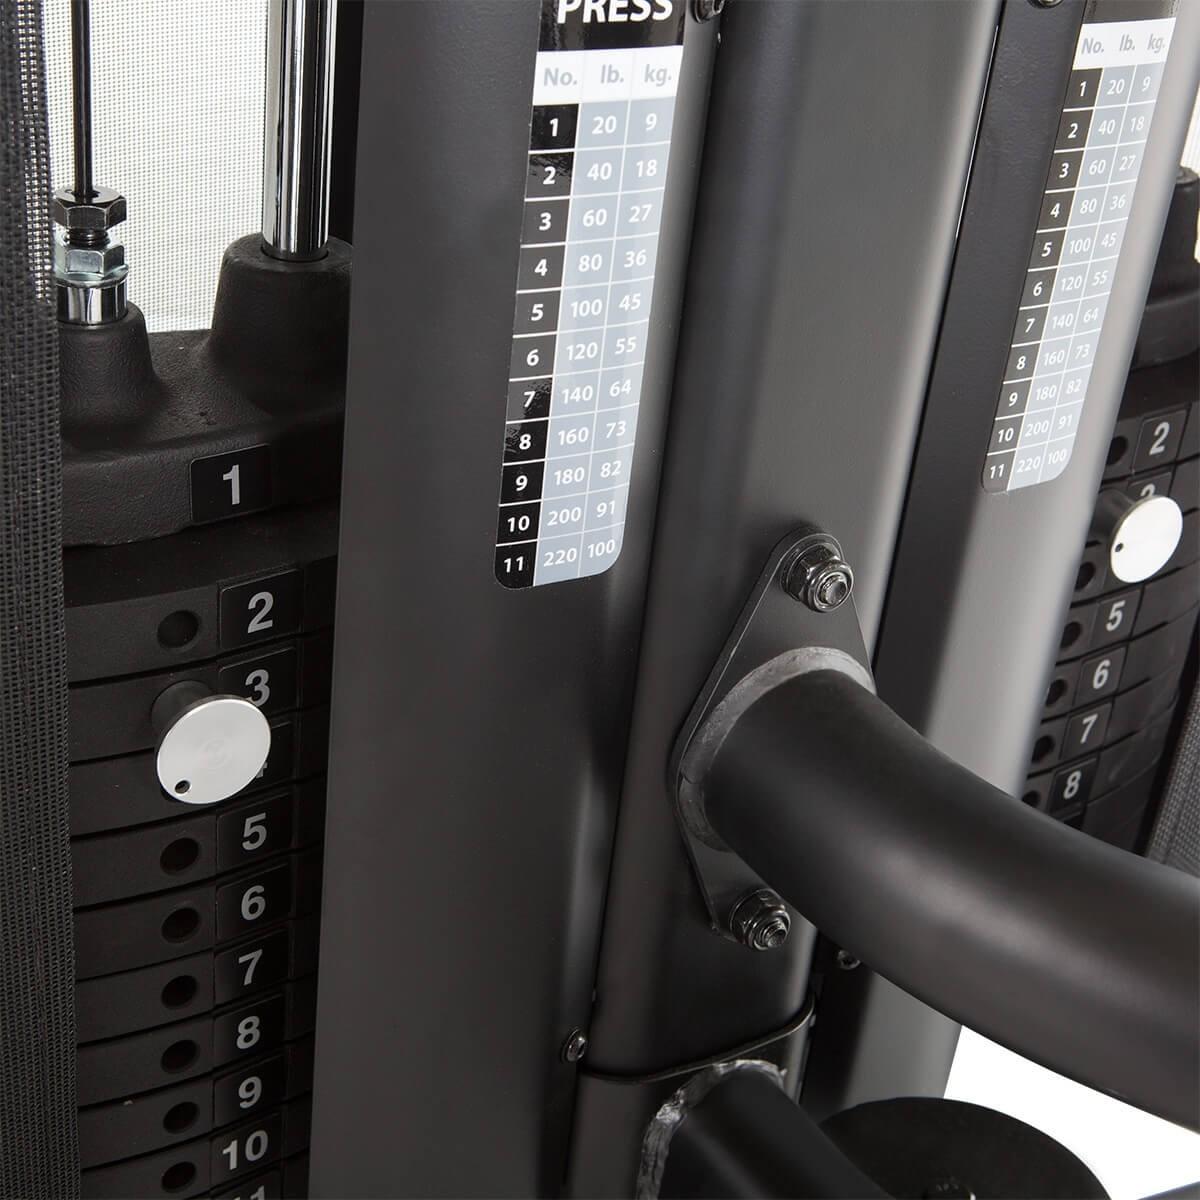 dual station presse cuisses mollets service premium du fabricant. Black Bedroom Furniture Sets. Home Design Ideas